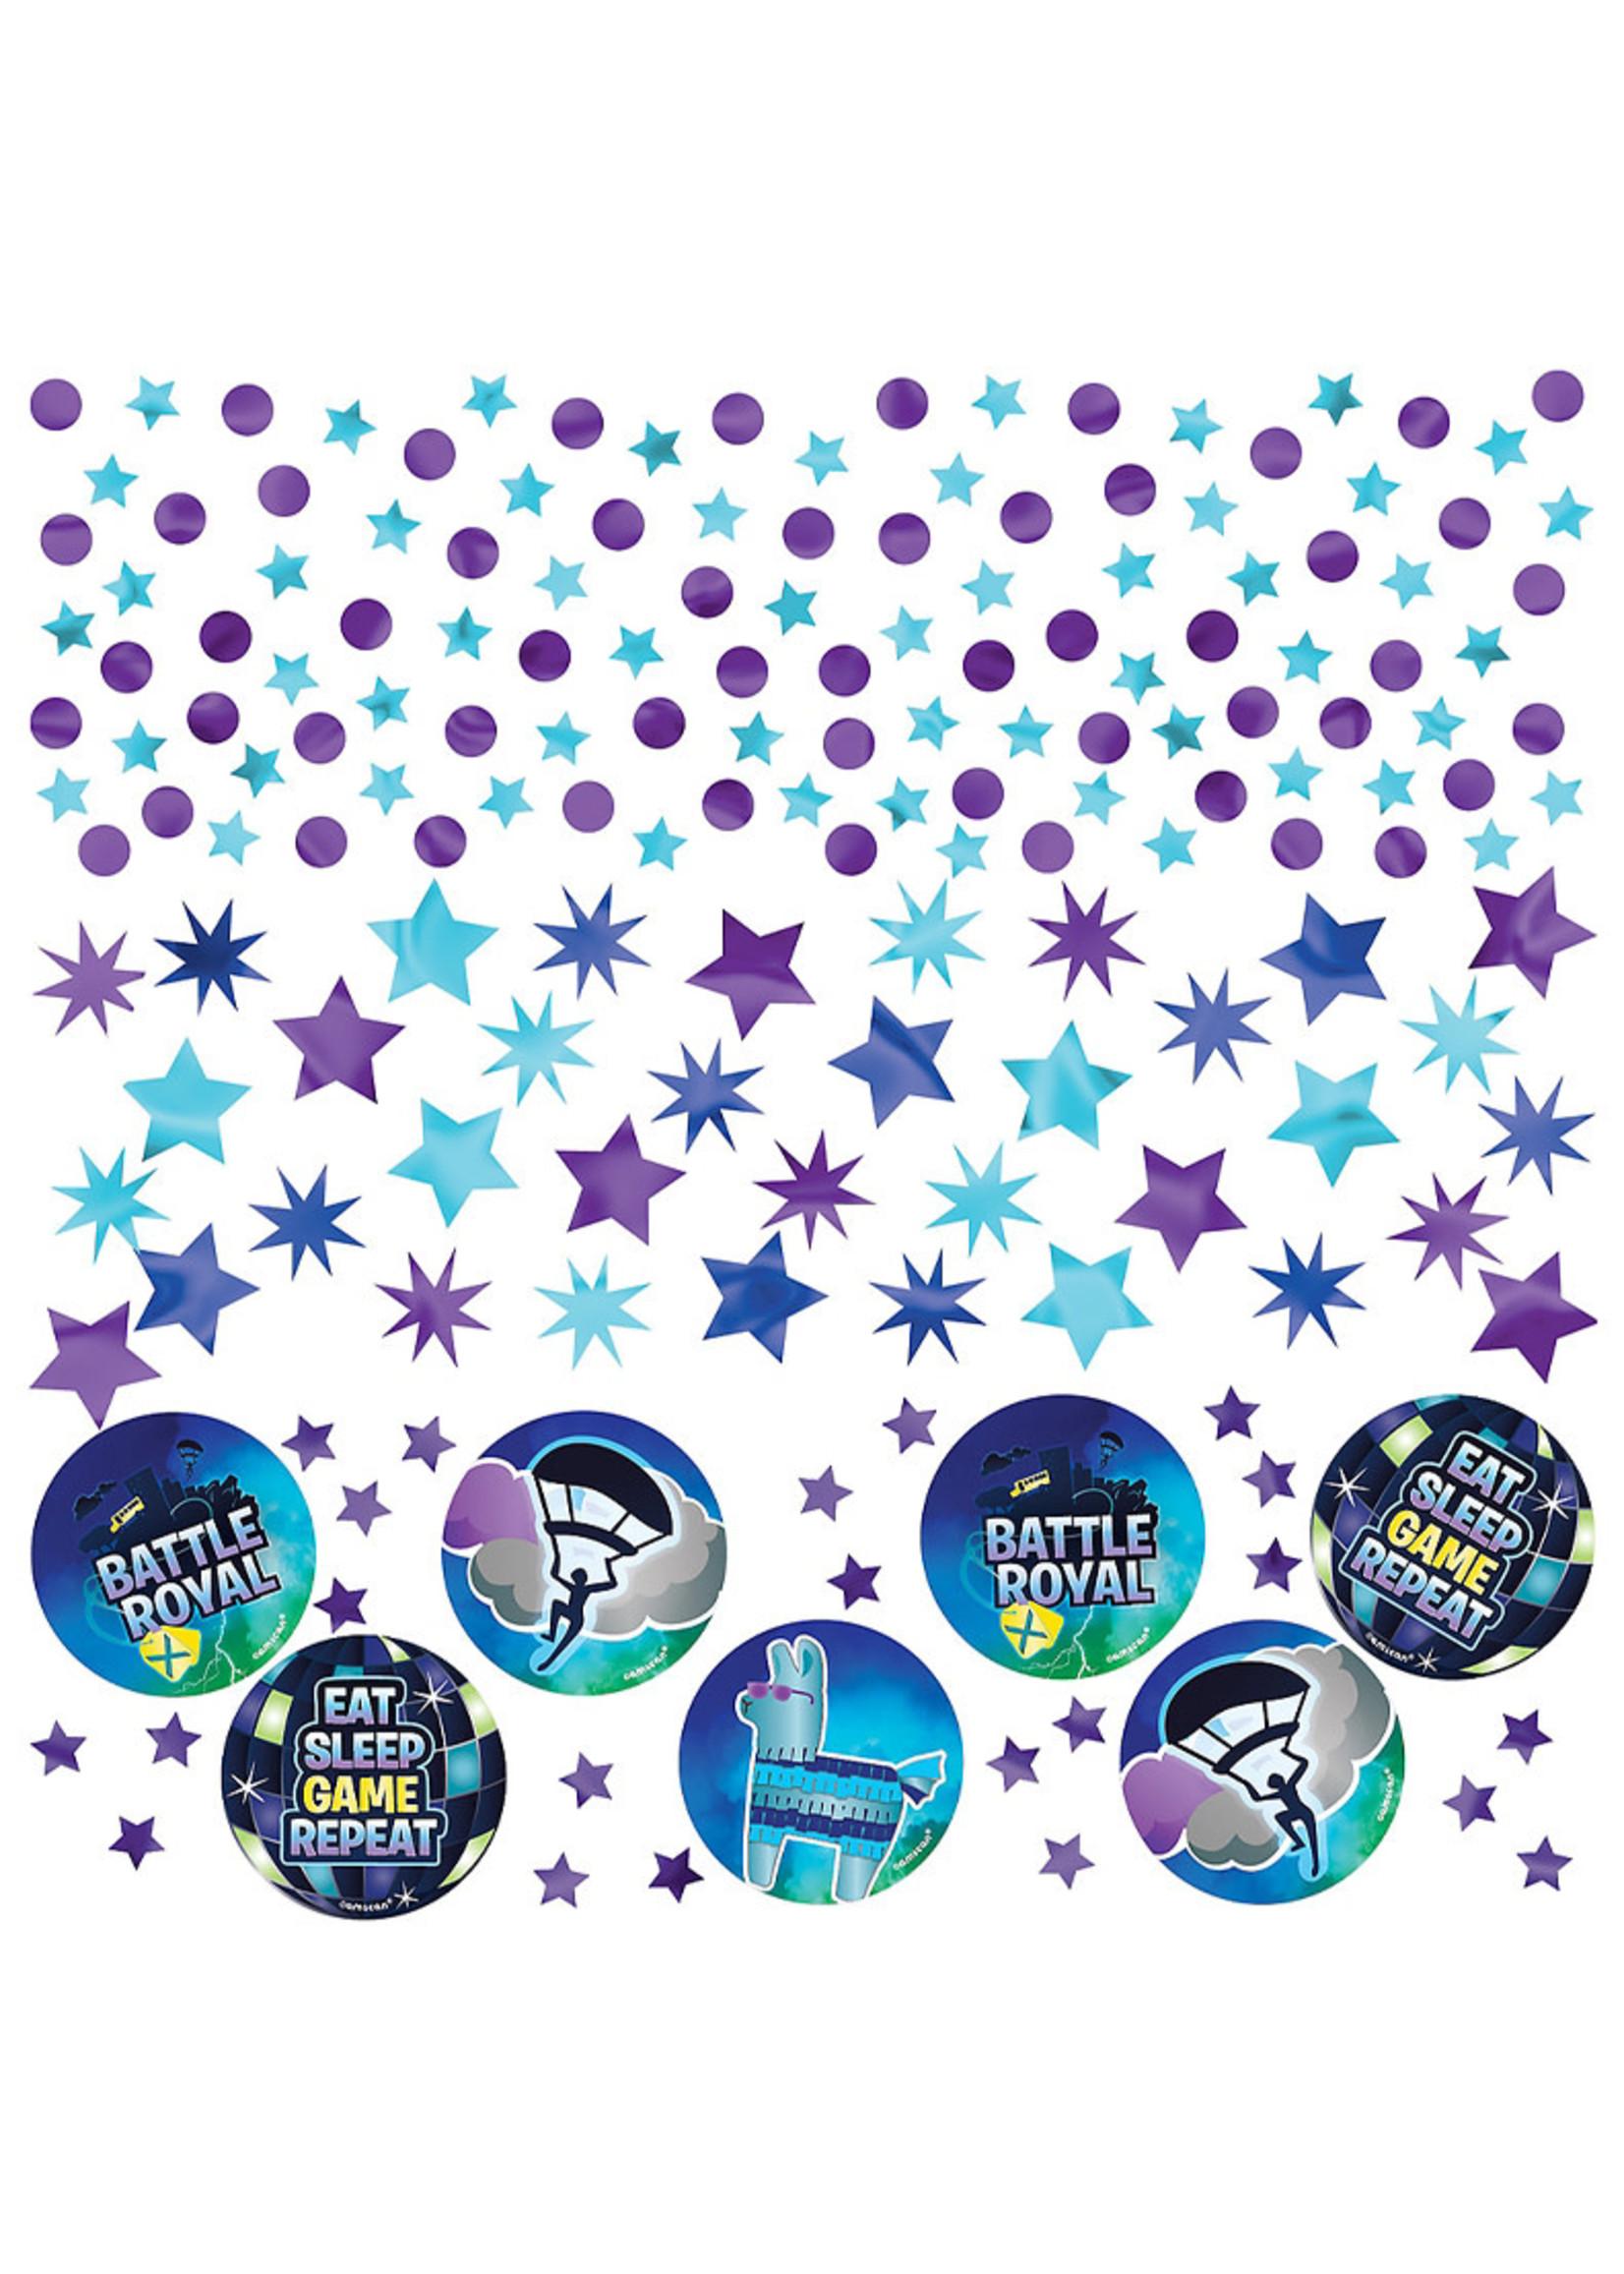 Battle Royal Confetti